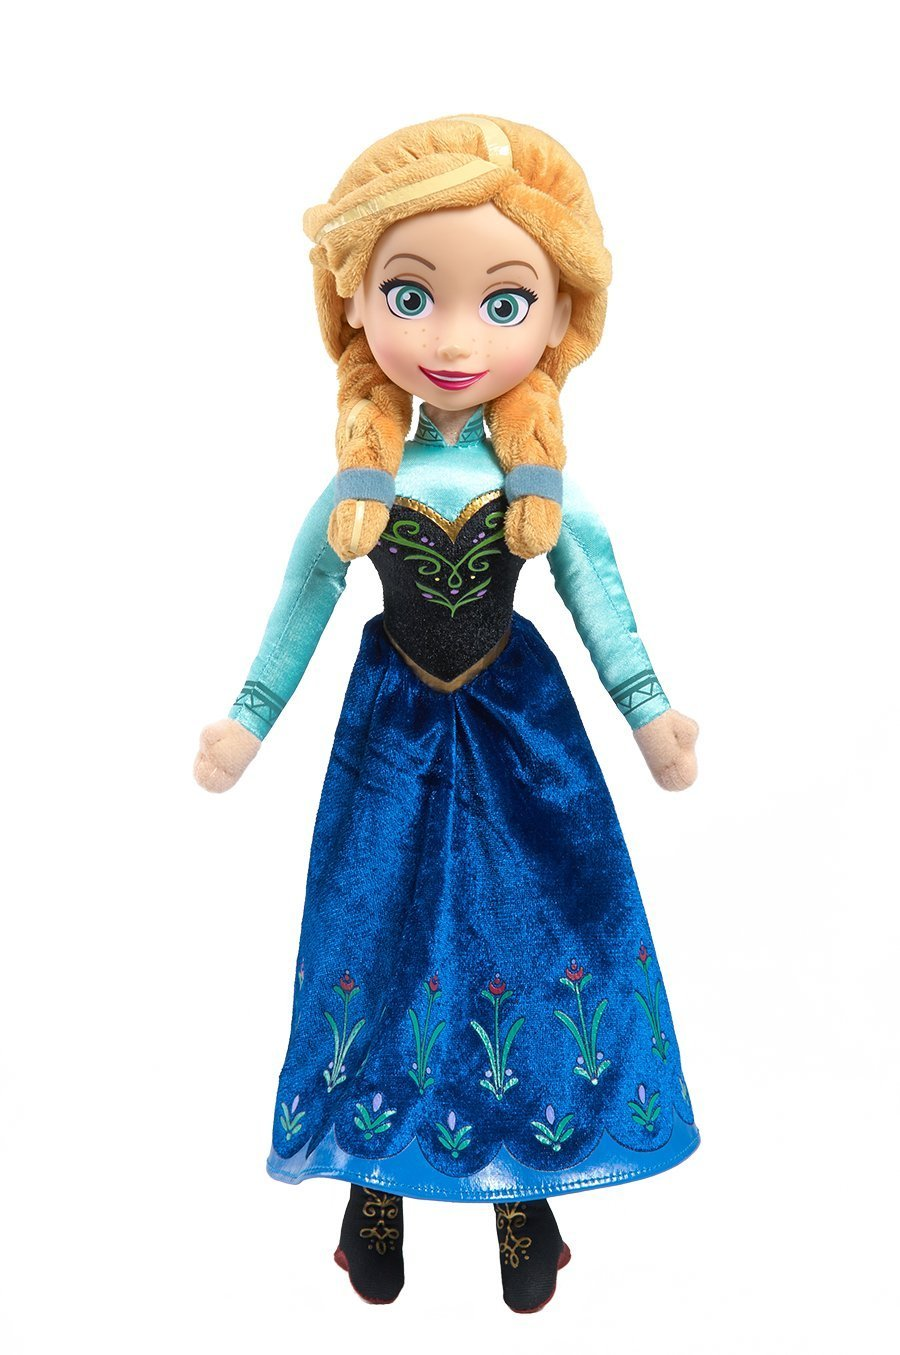 Papusa Disney,plus,Frozen,Elsa,Anna,canta,38cm